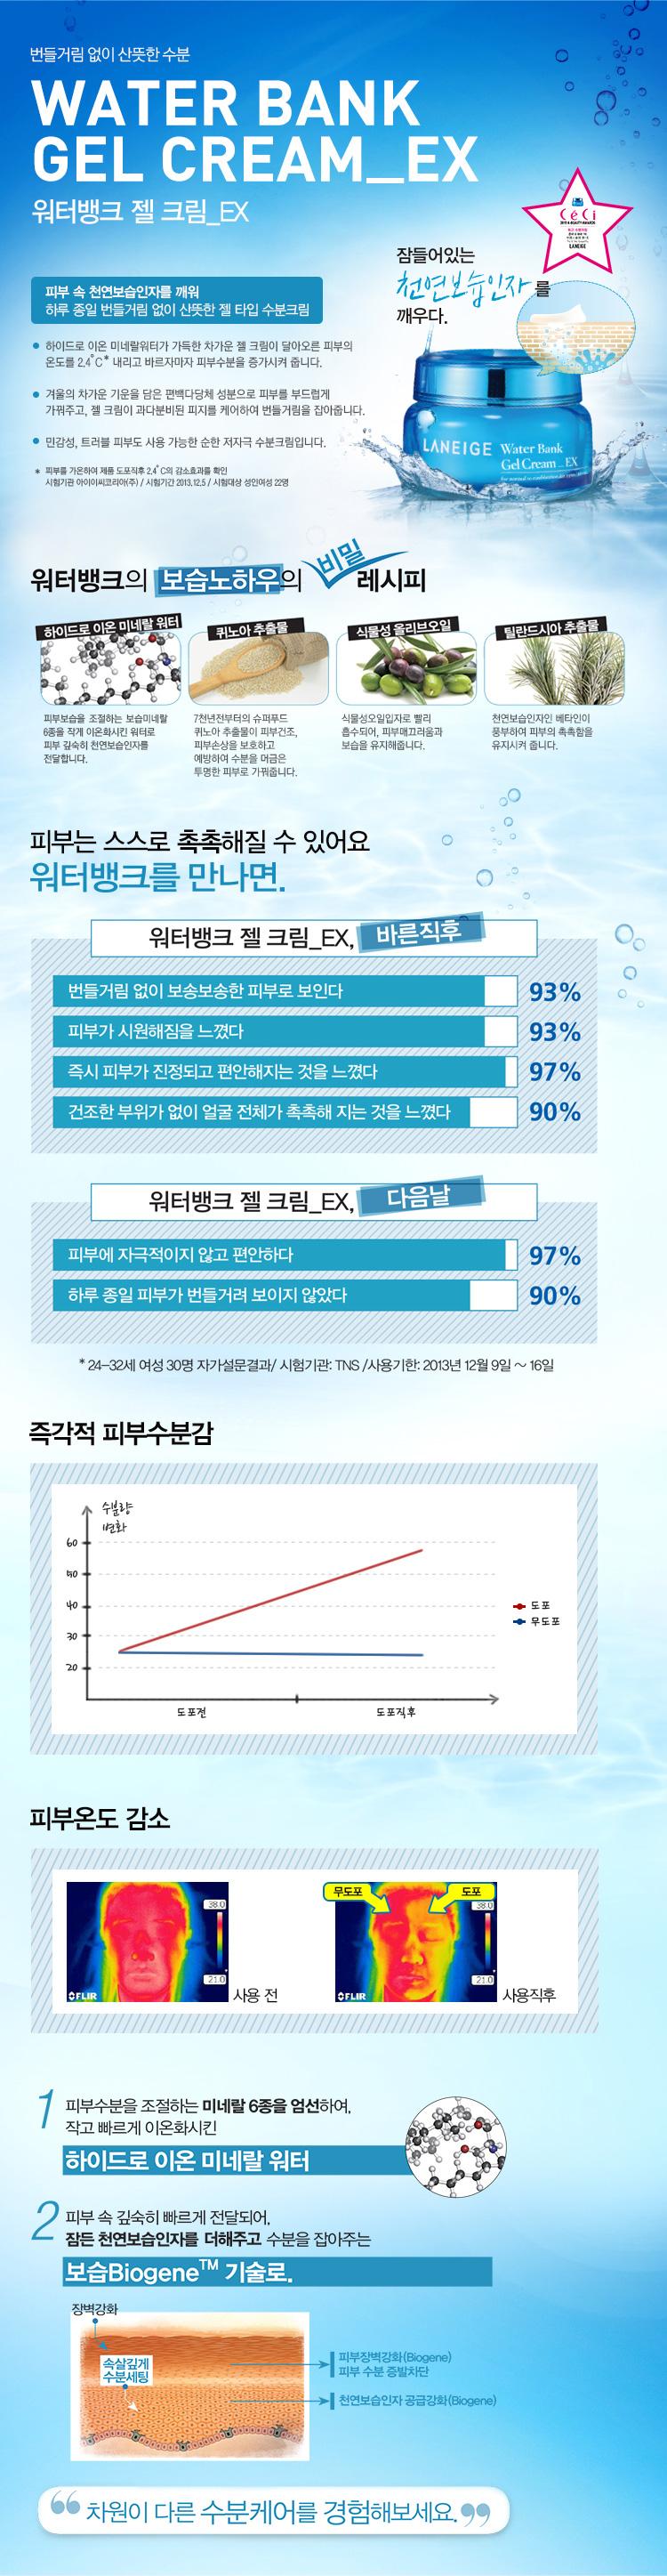 %EC%9B%8C%ED%84%B0%EB%B1%85%ED%81%AC-%EC%A0%A4%ED%81%AC%EB%A6%BC-EX.jpg